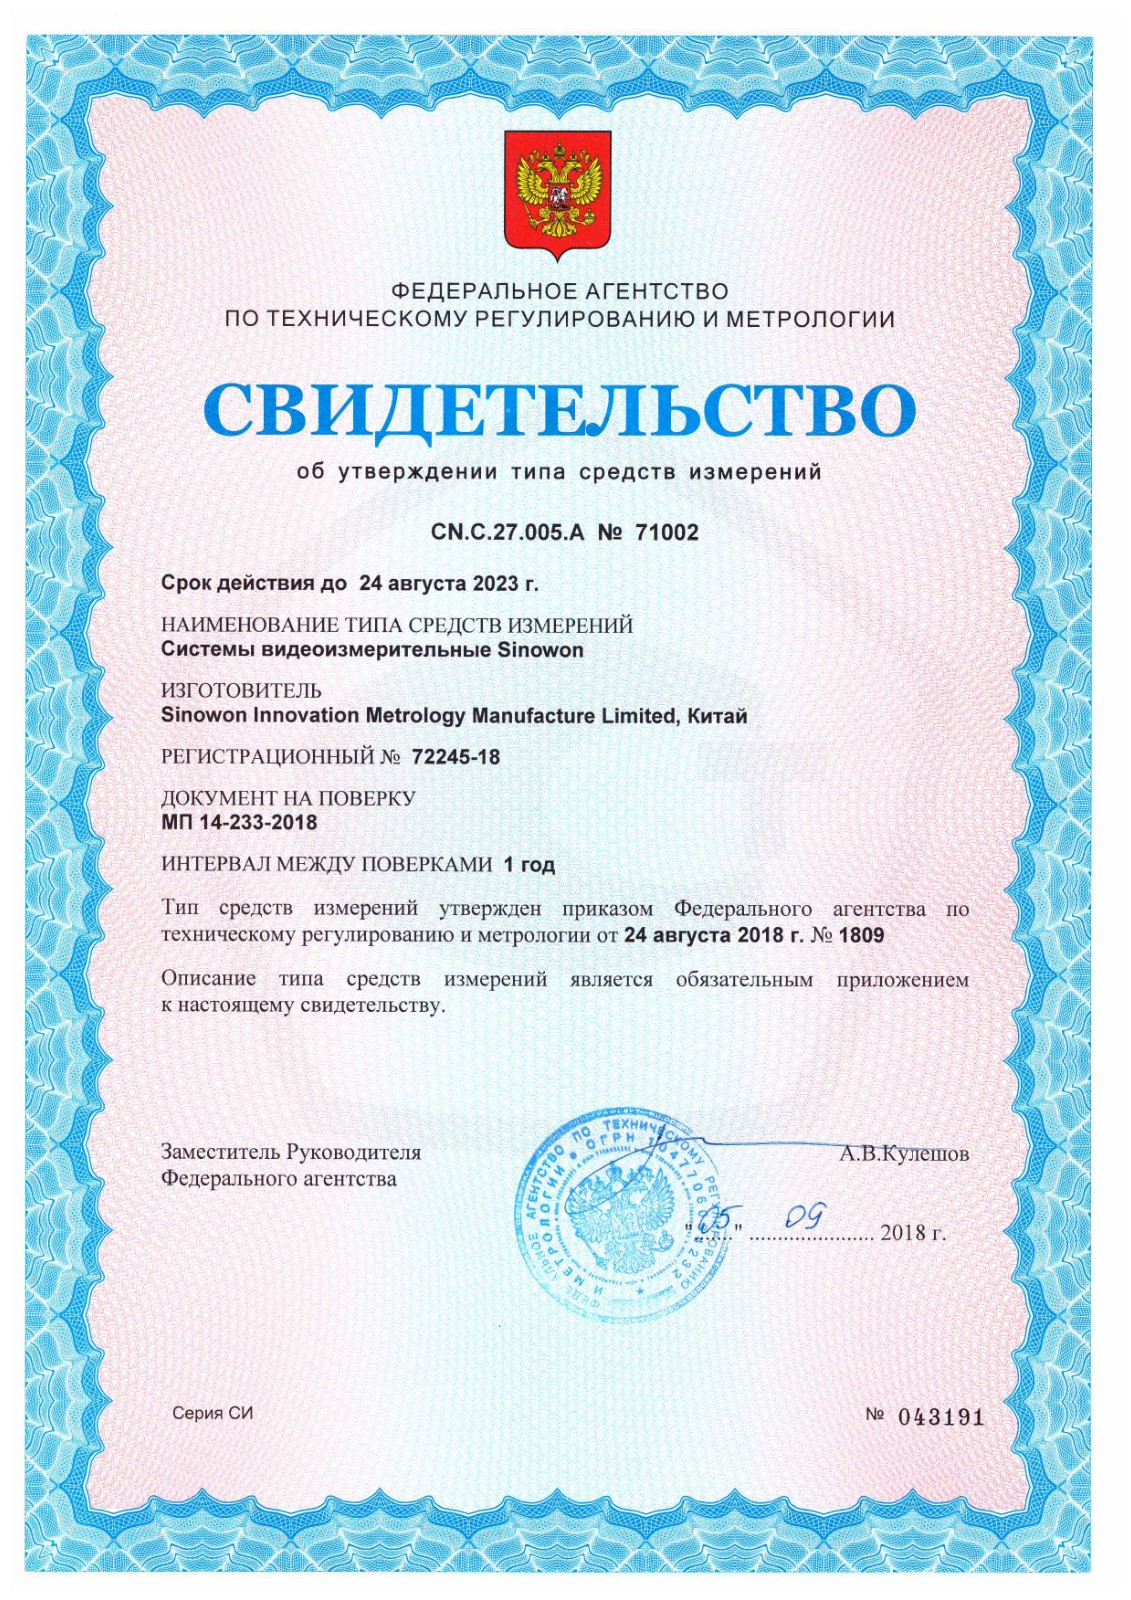 Russian Gost certificate